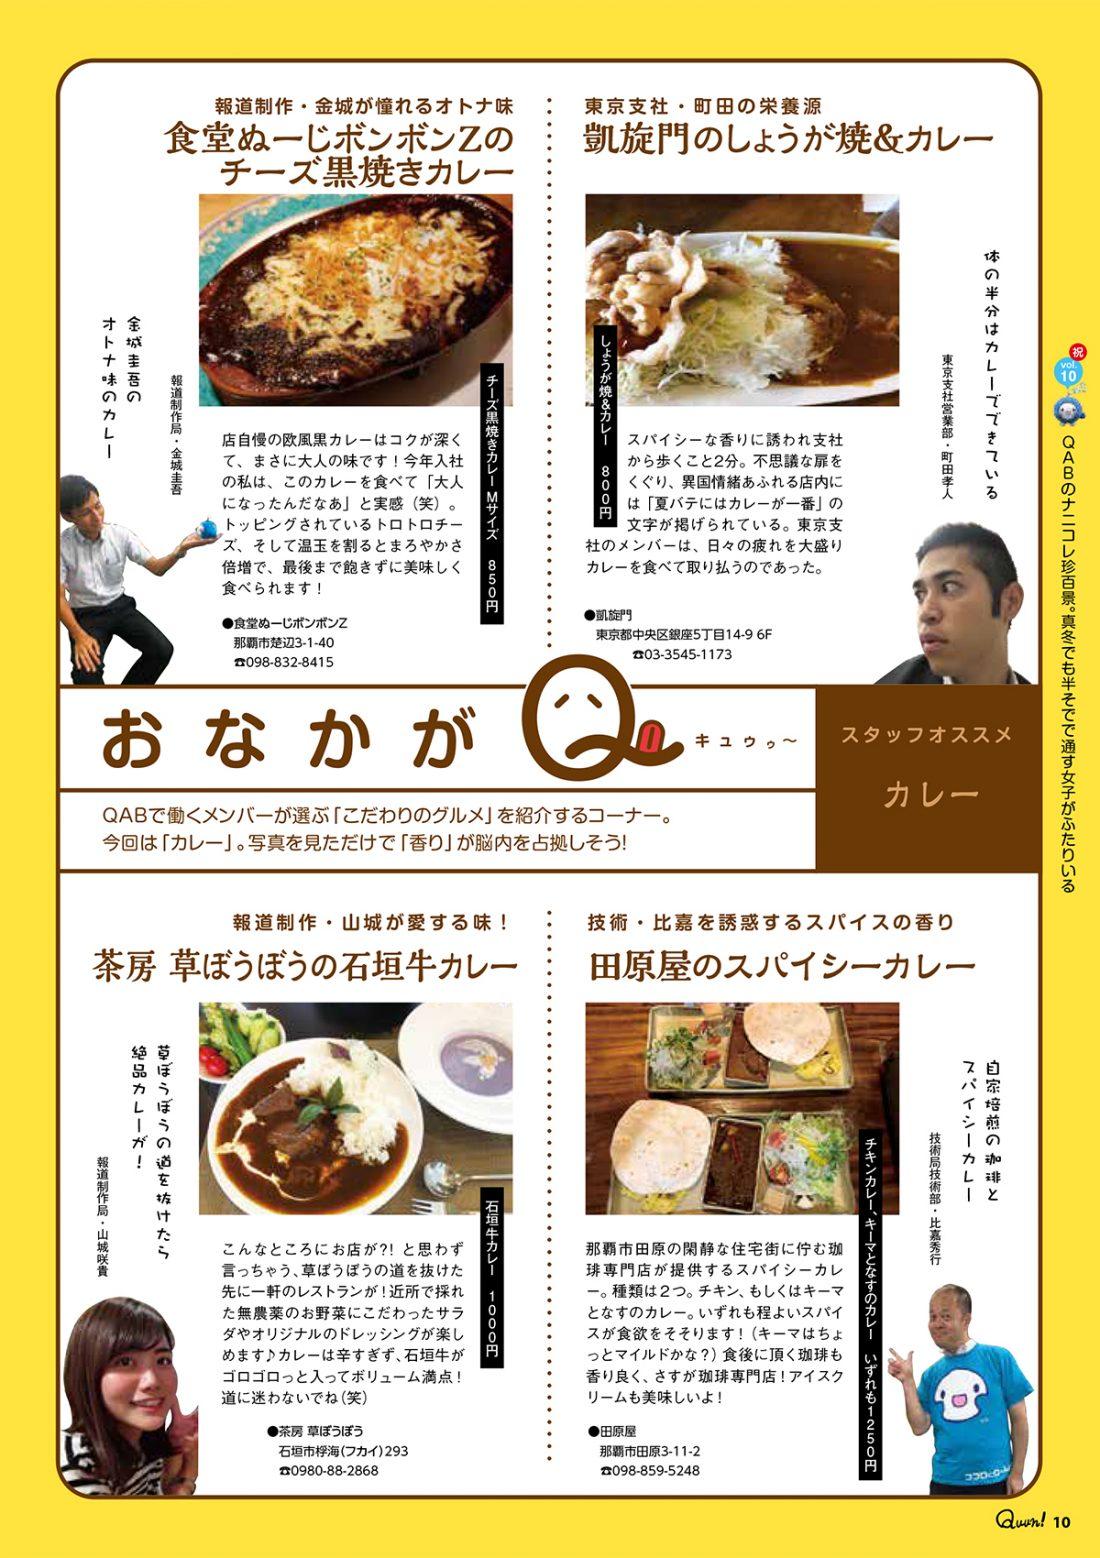 https://www.qab.co.jp/qgoro/wp-content/uploads/quun_1012-1100x1558.jpg